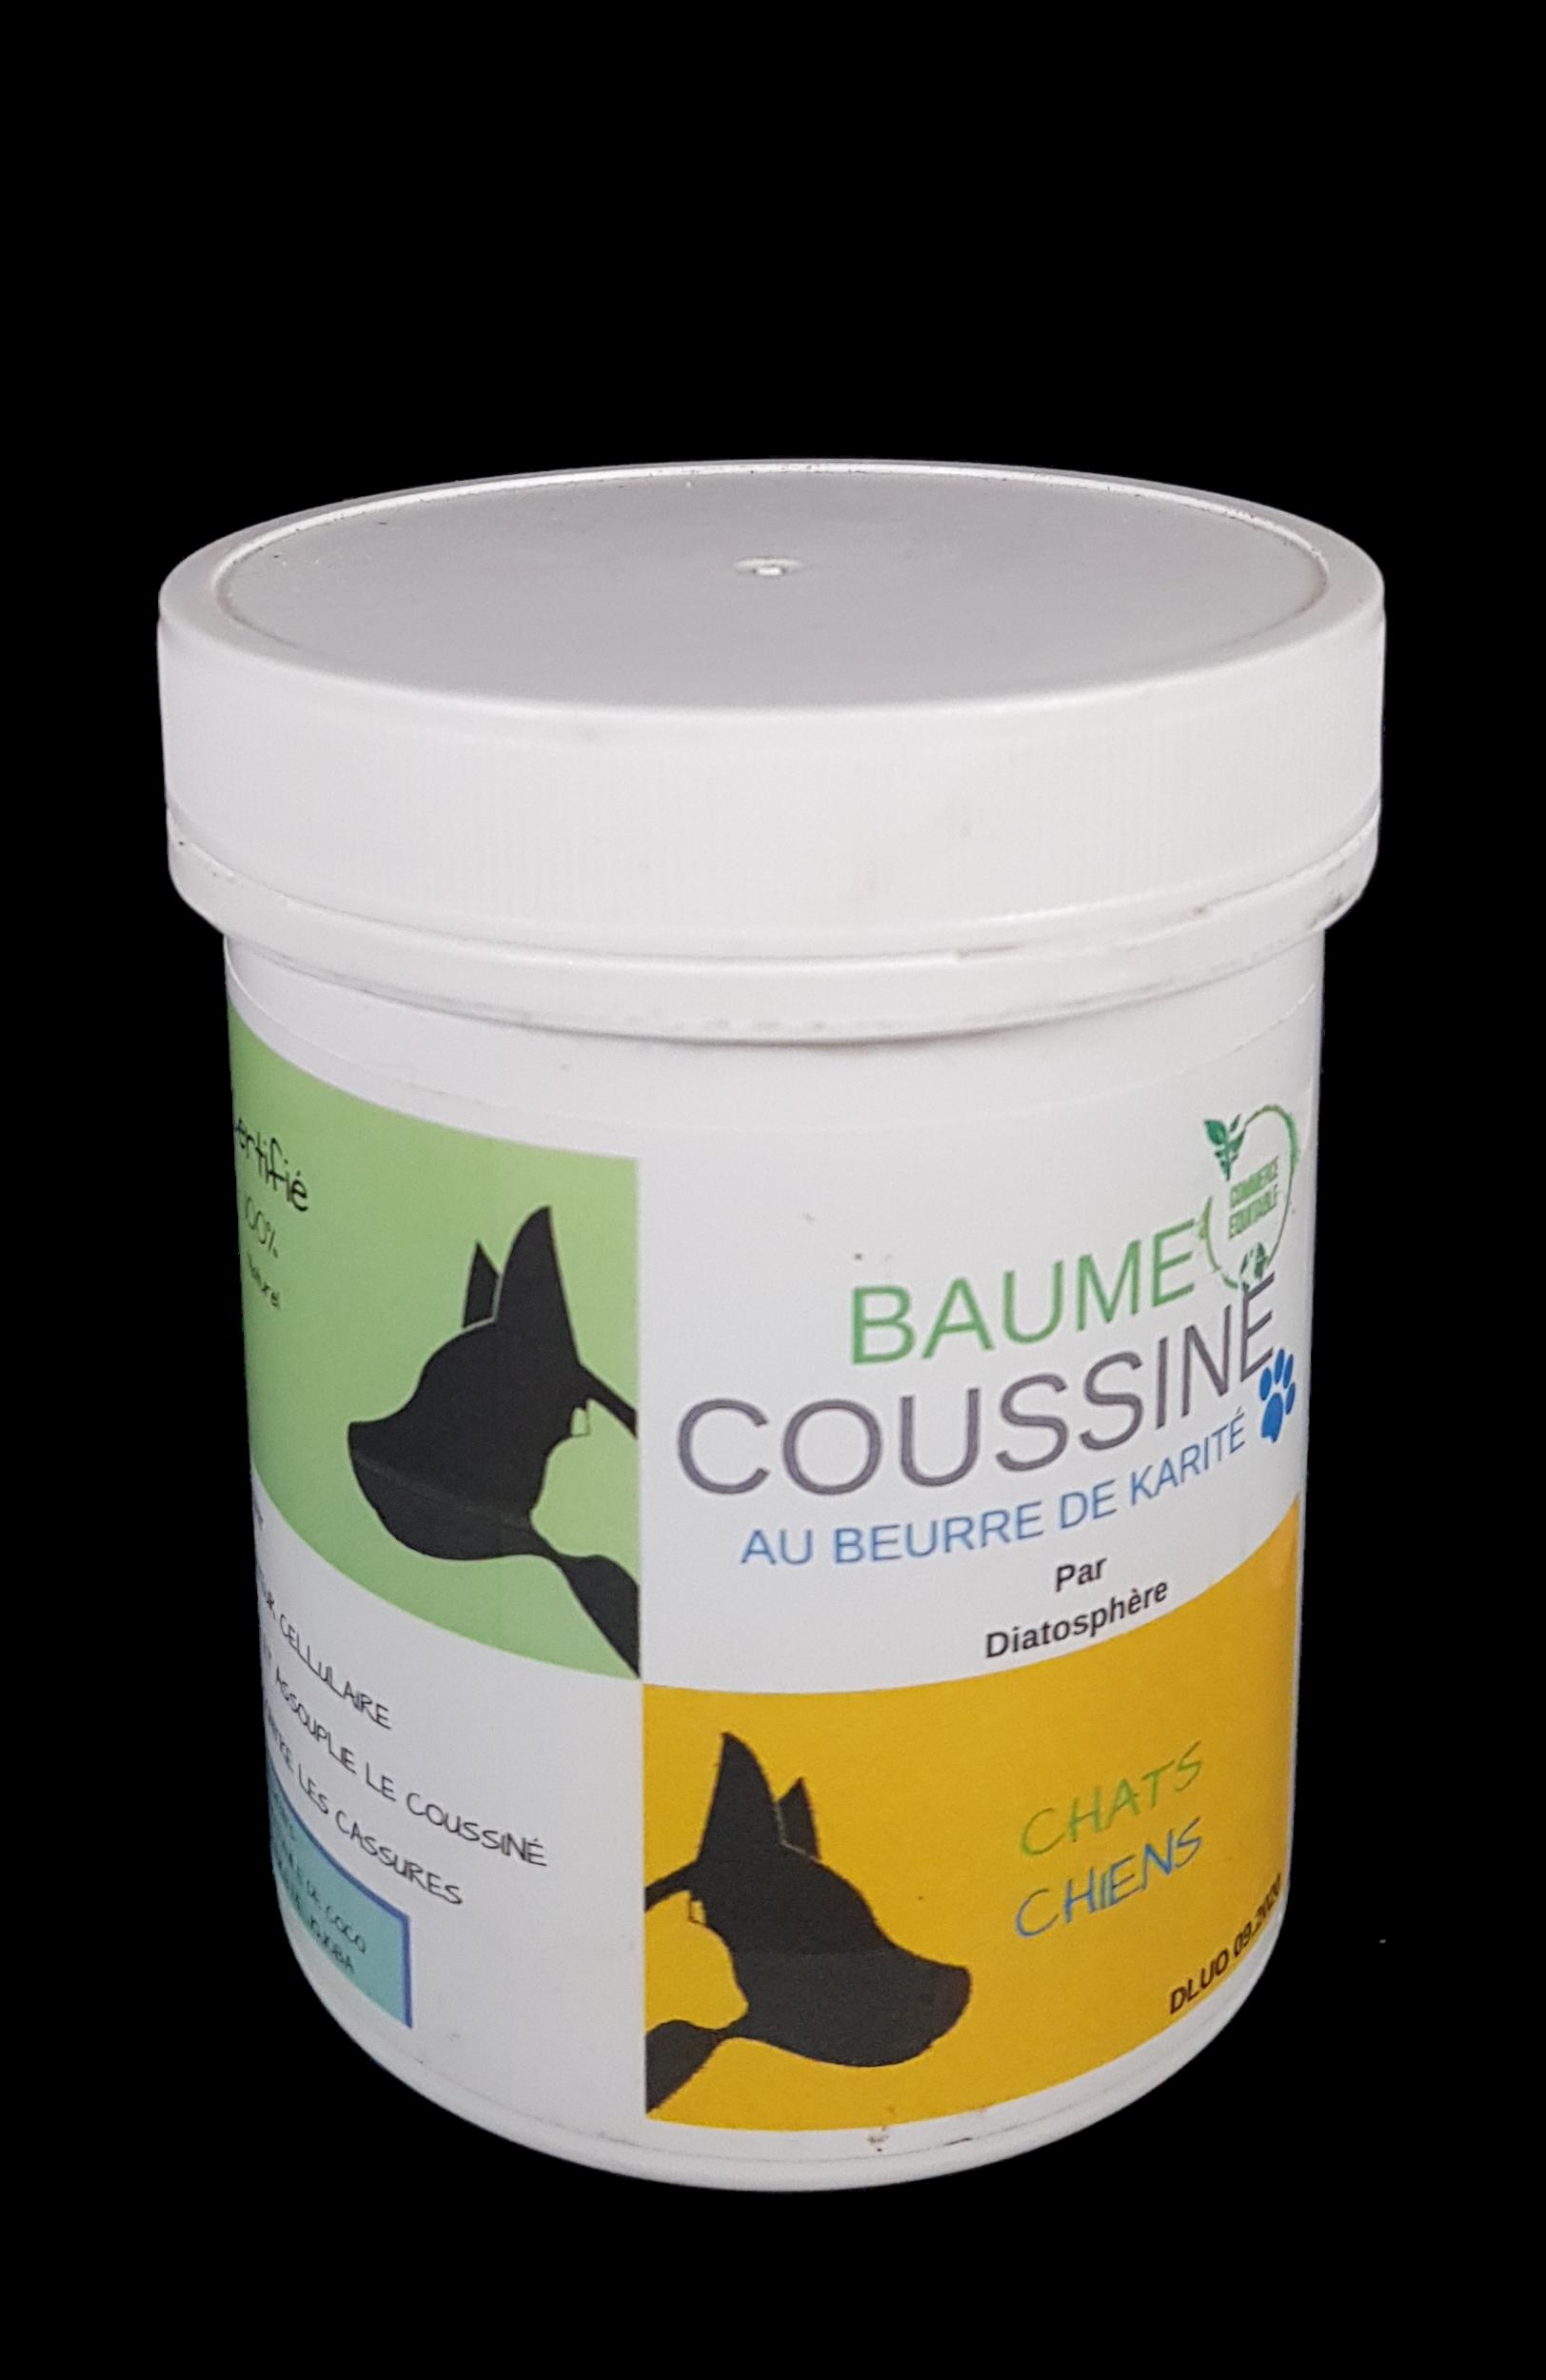 Baume Coussinet